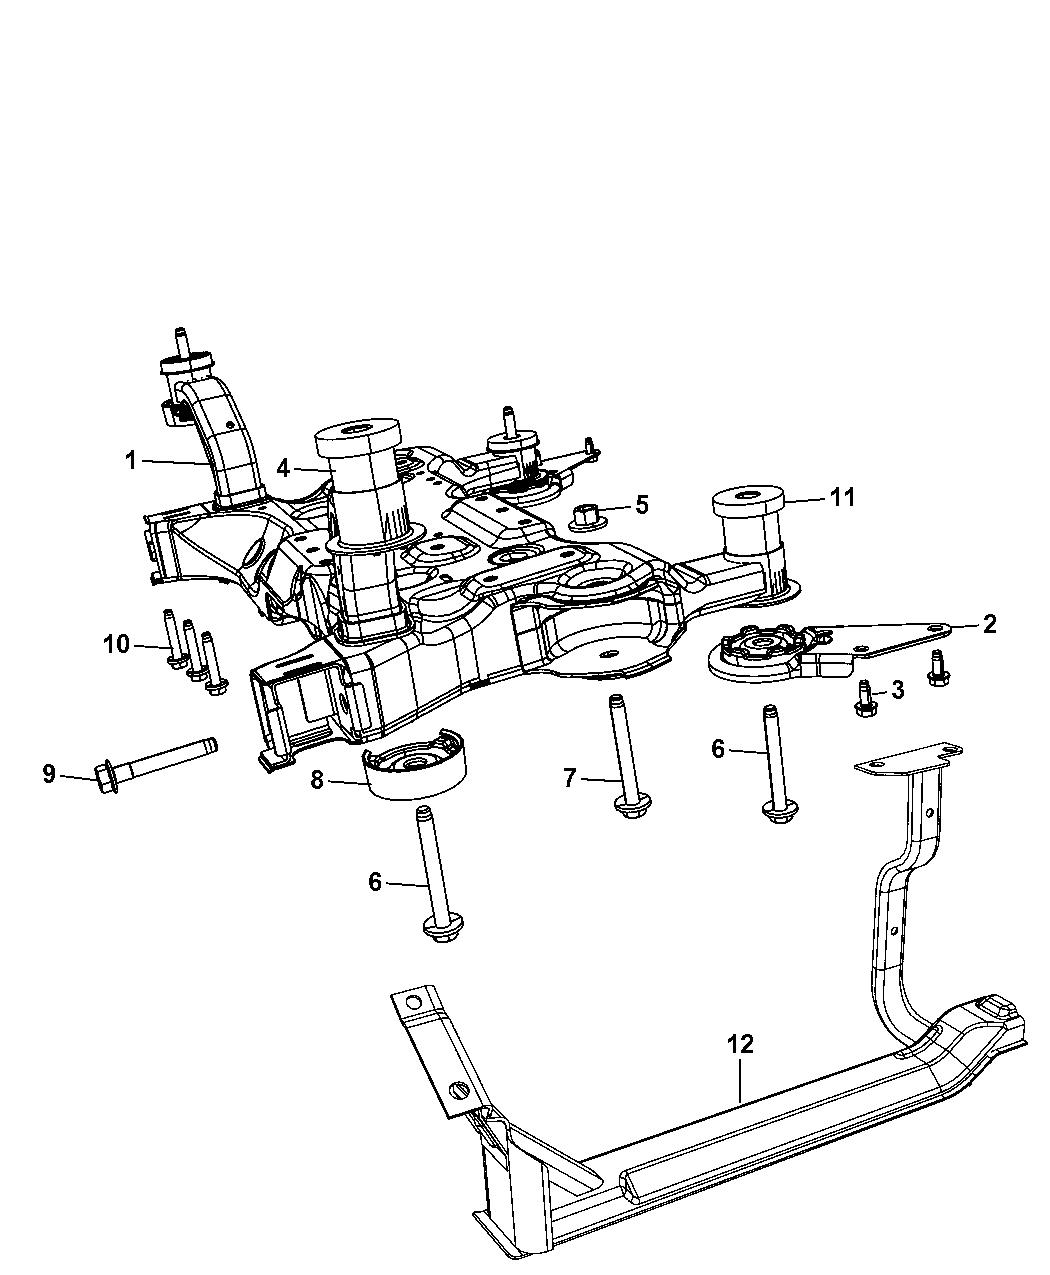 2009 Dodge Journey Crossmember Front Suspension Wiring Schematic